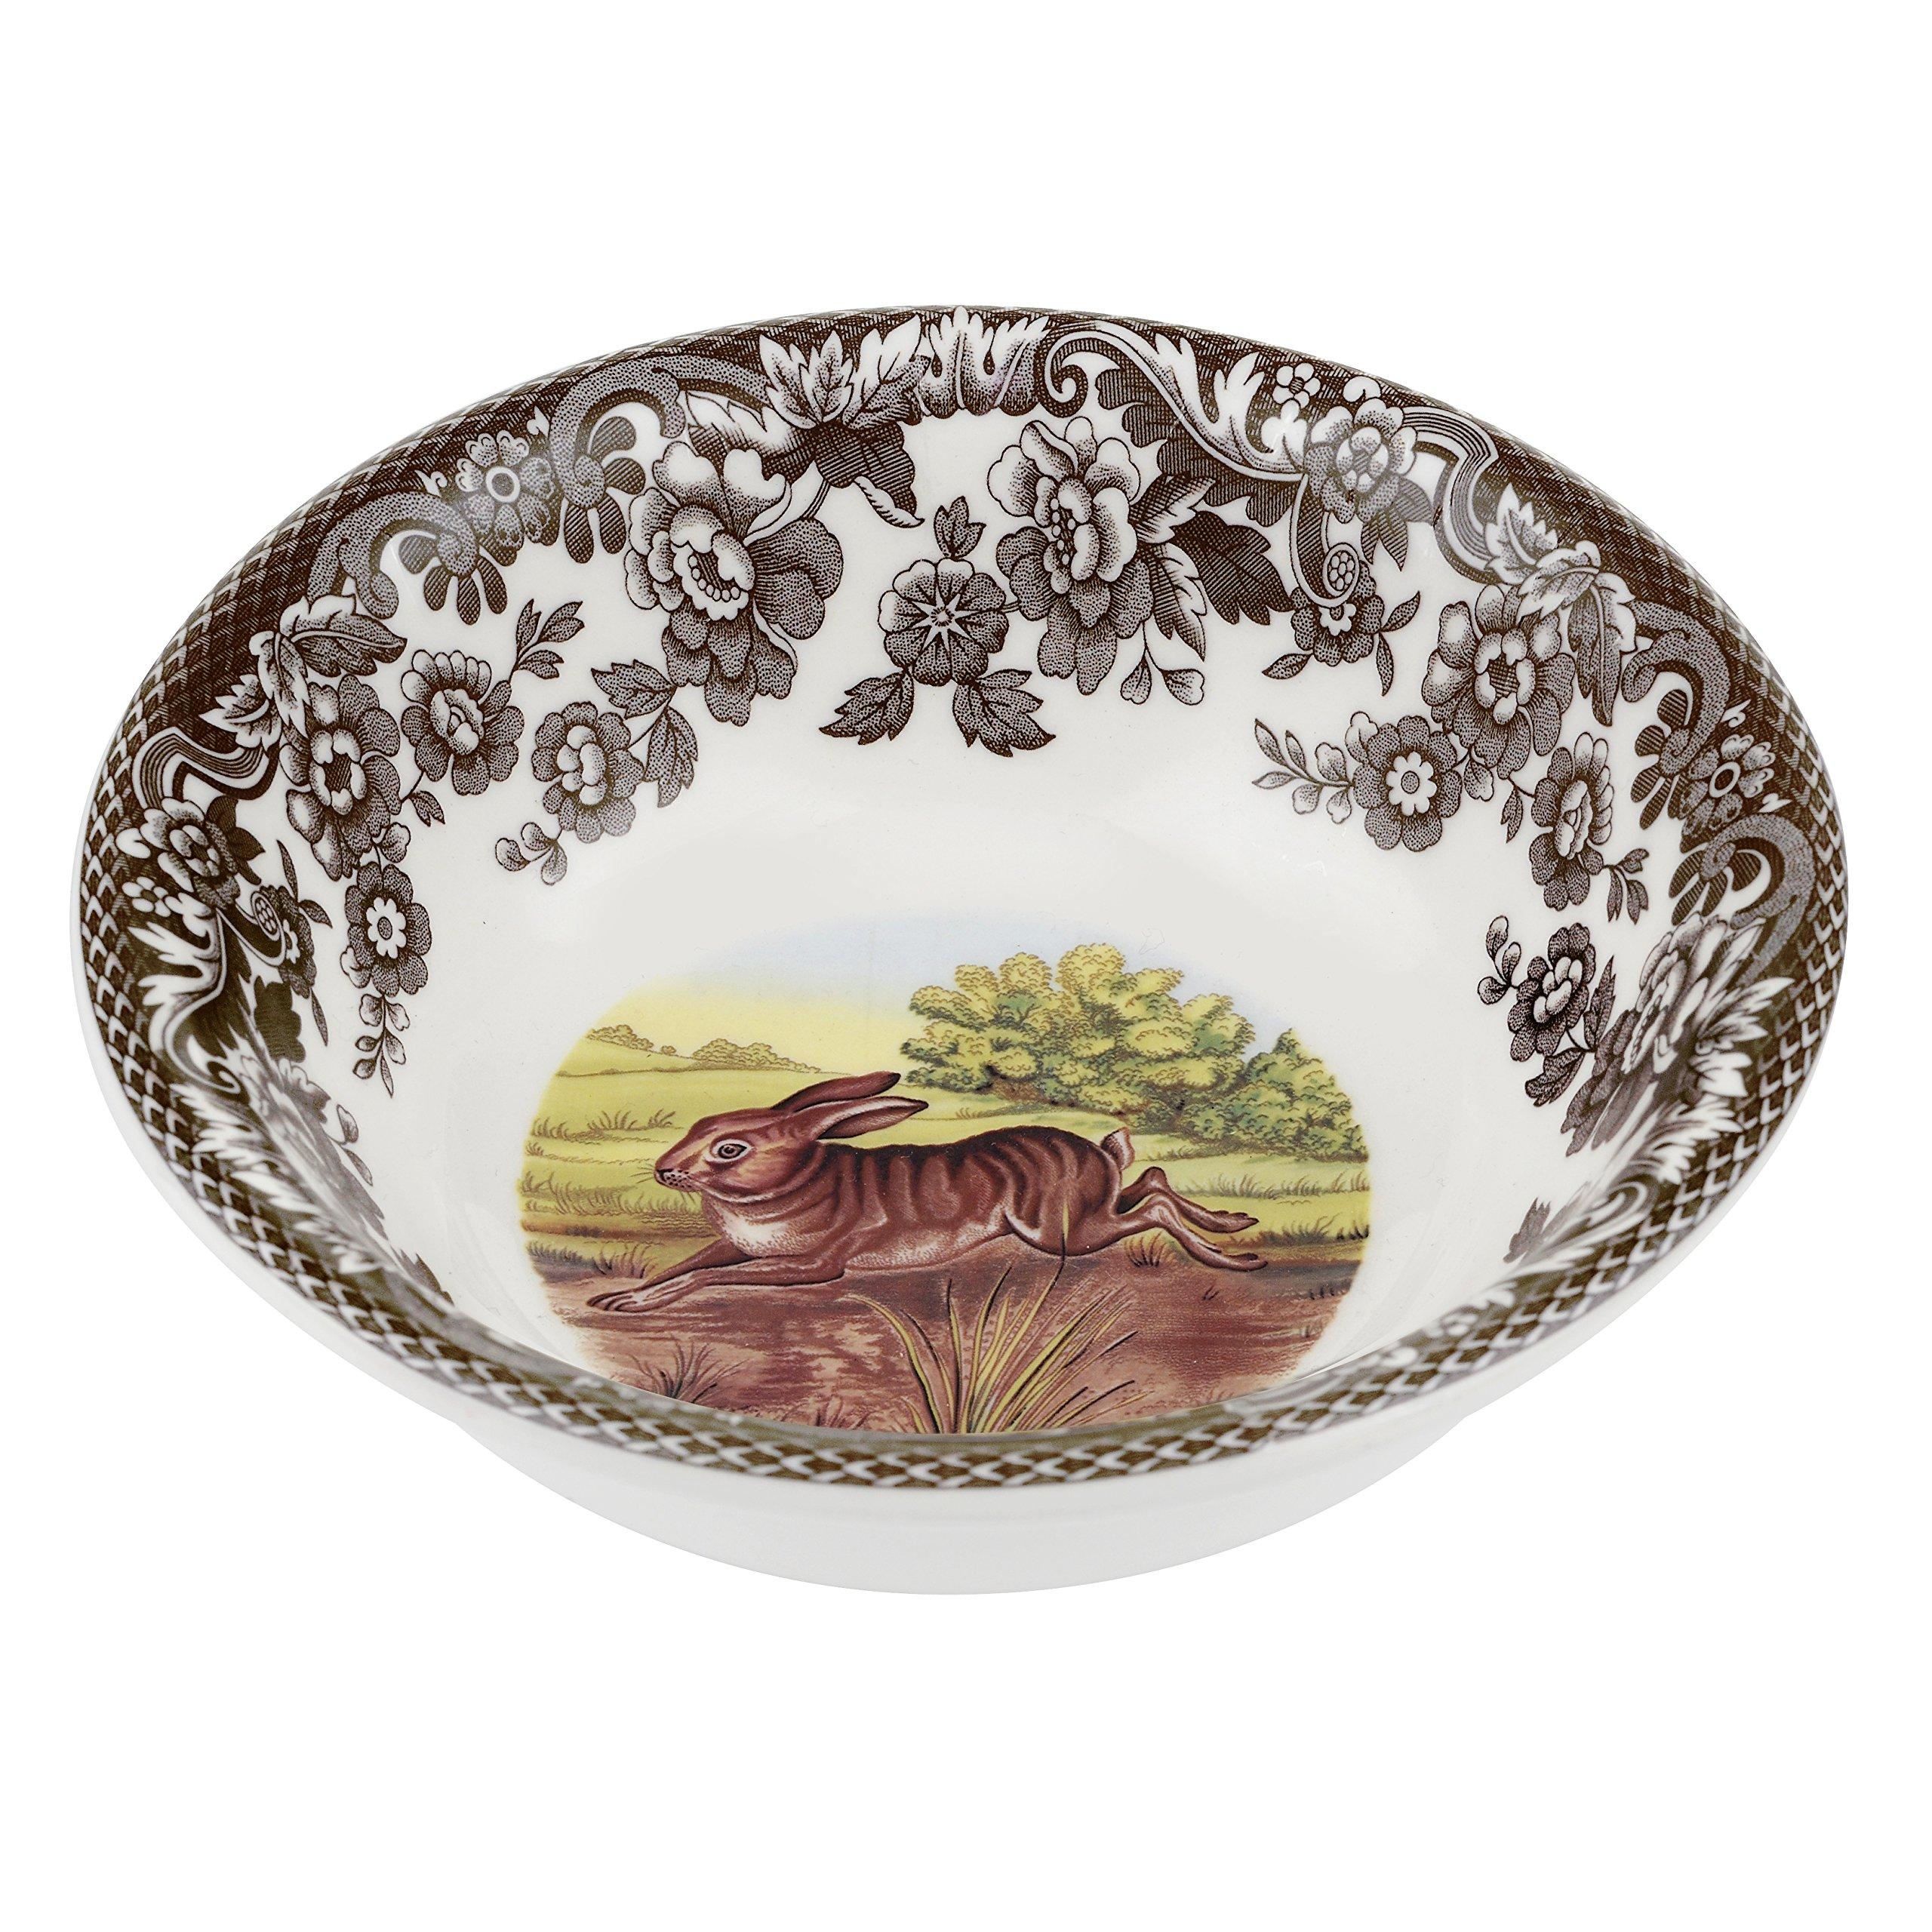 Spode 1606272 Woodland Rabbit Mini Bowl